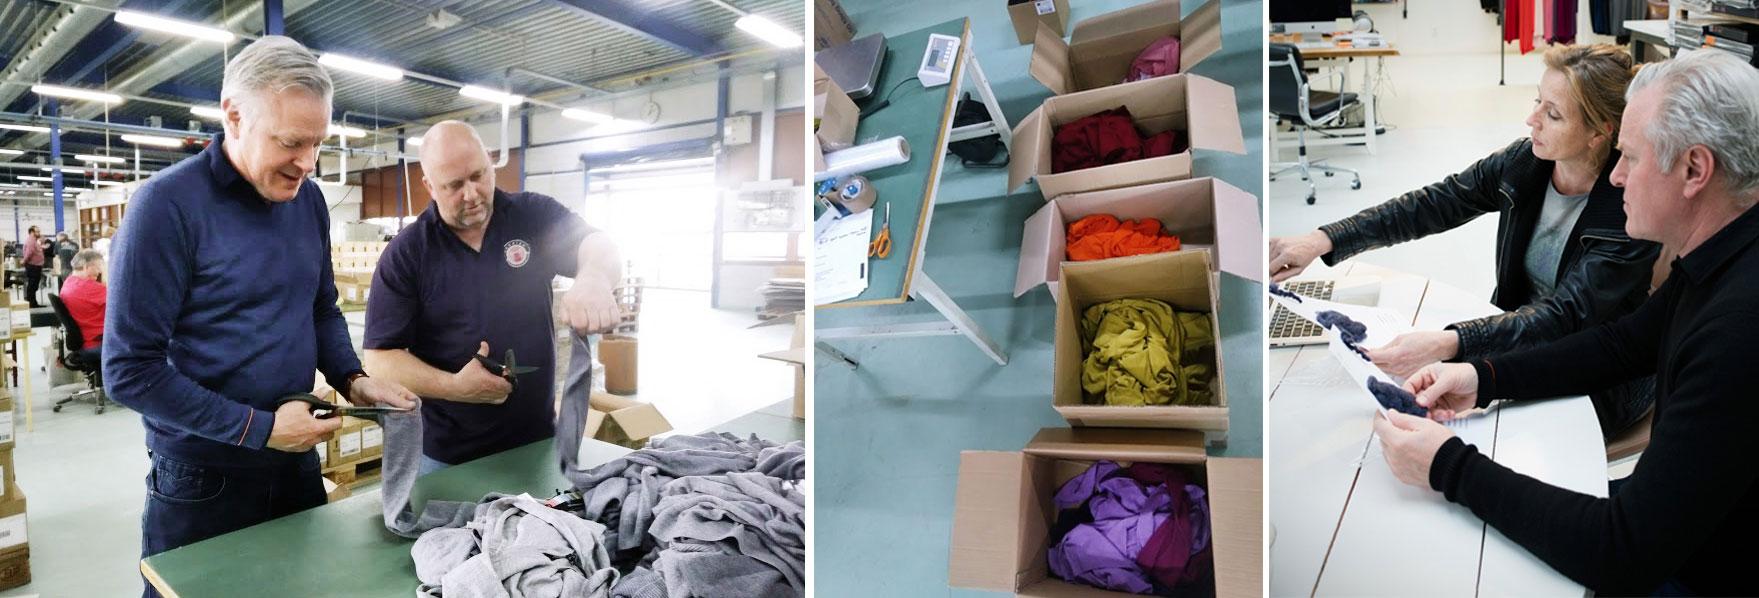 Recycelte Pullover aus Merinowolle: Joe Merino produziert nachhaltige Recycling Pullover.